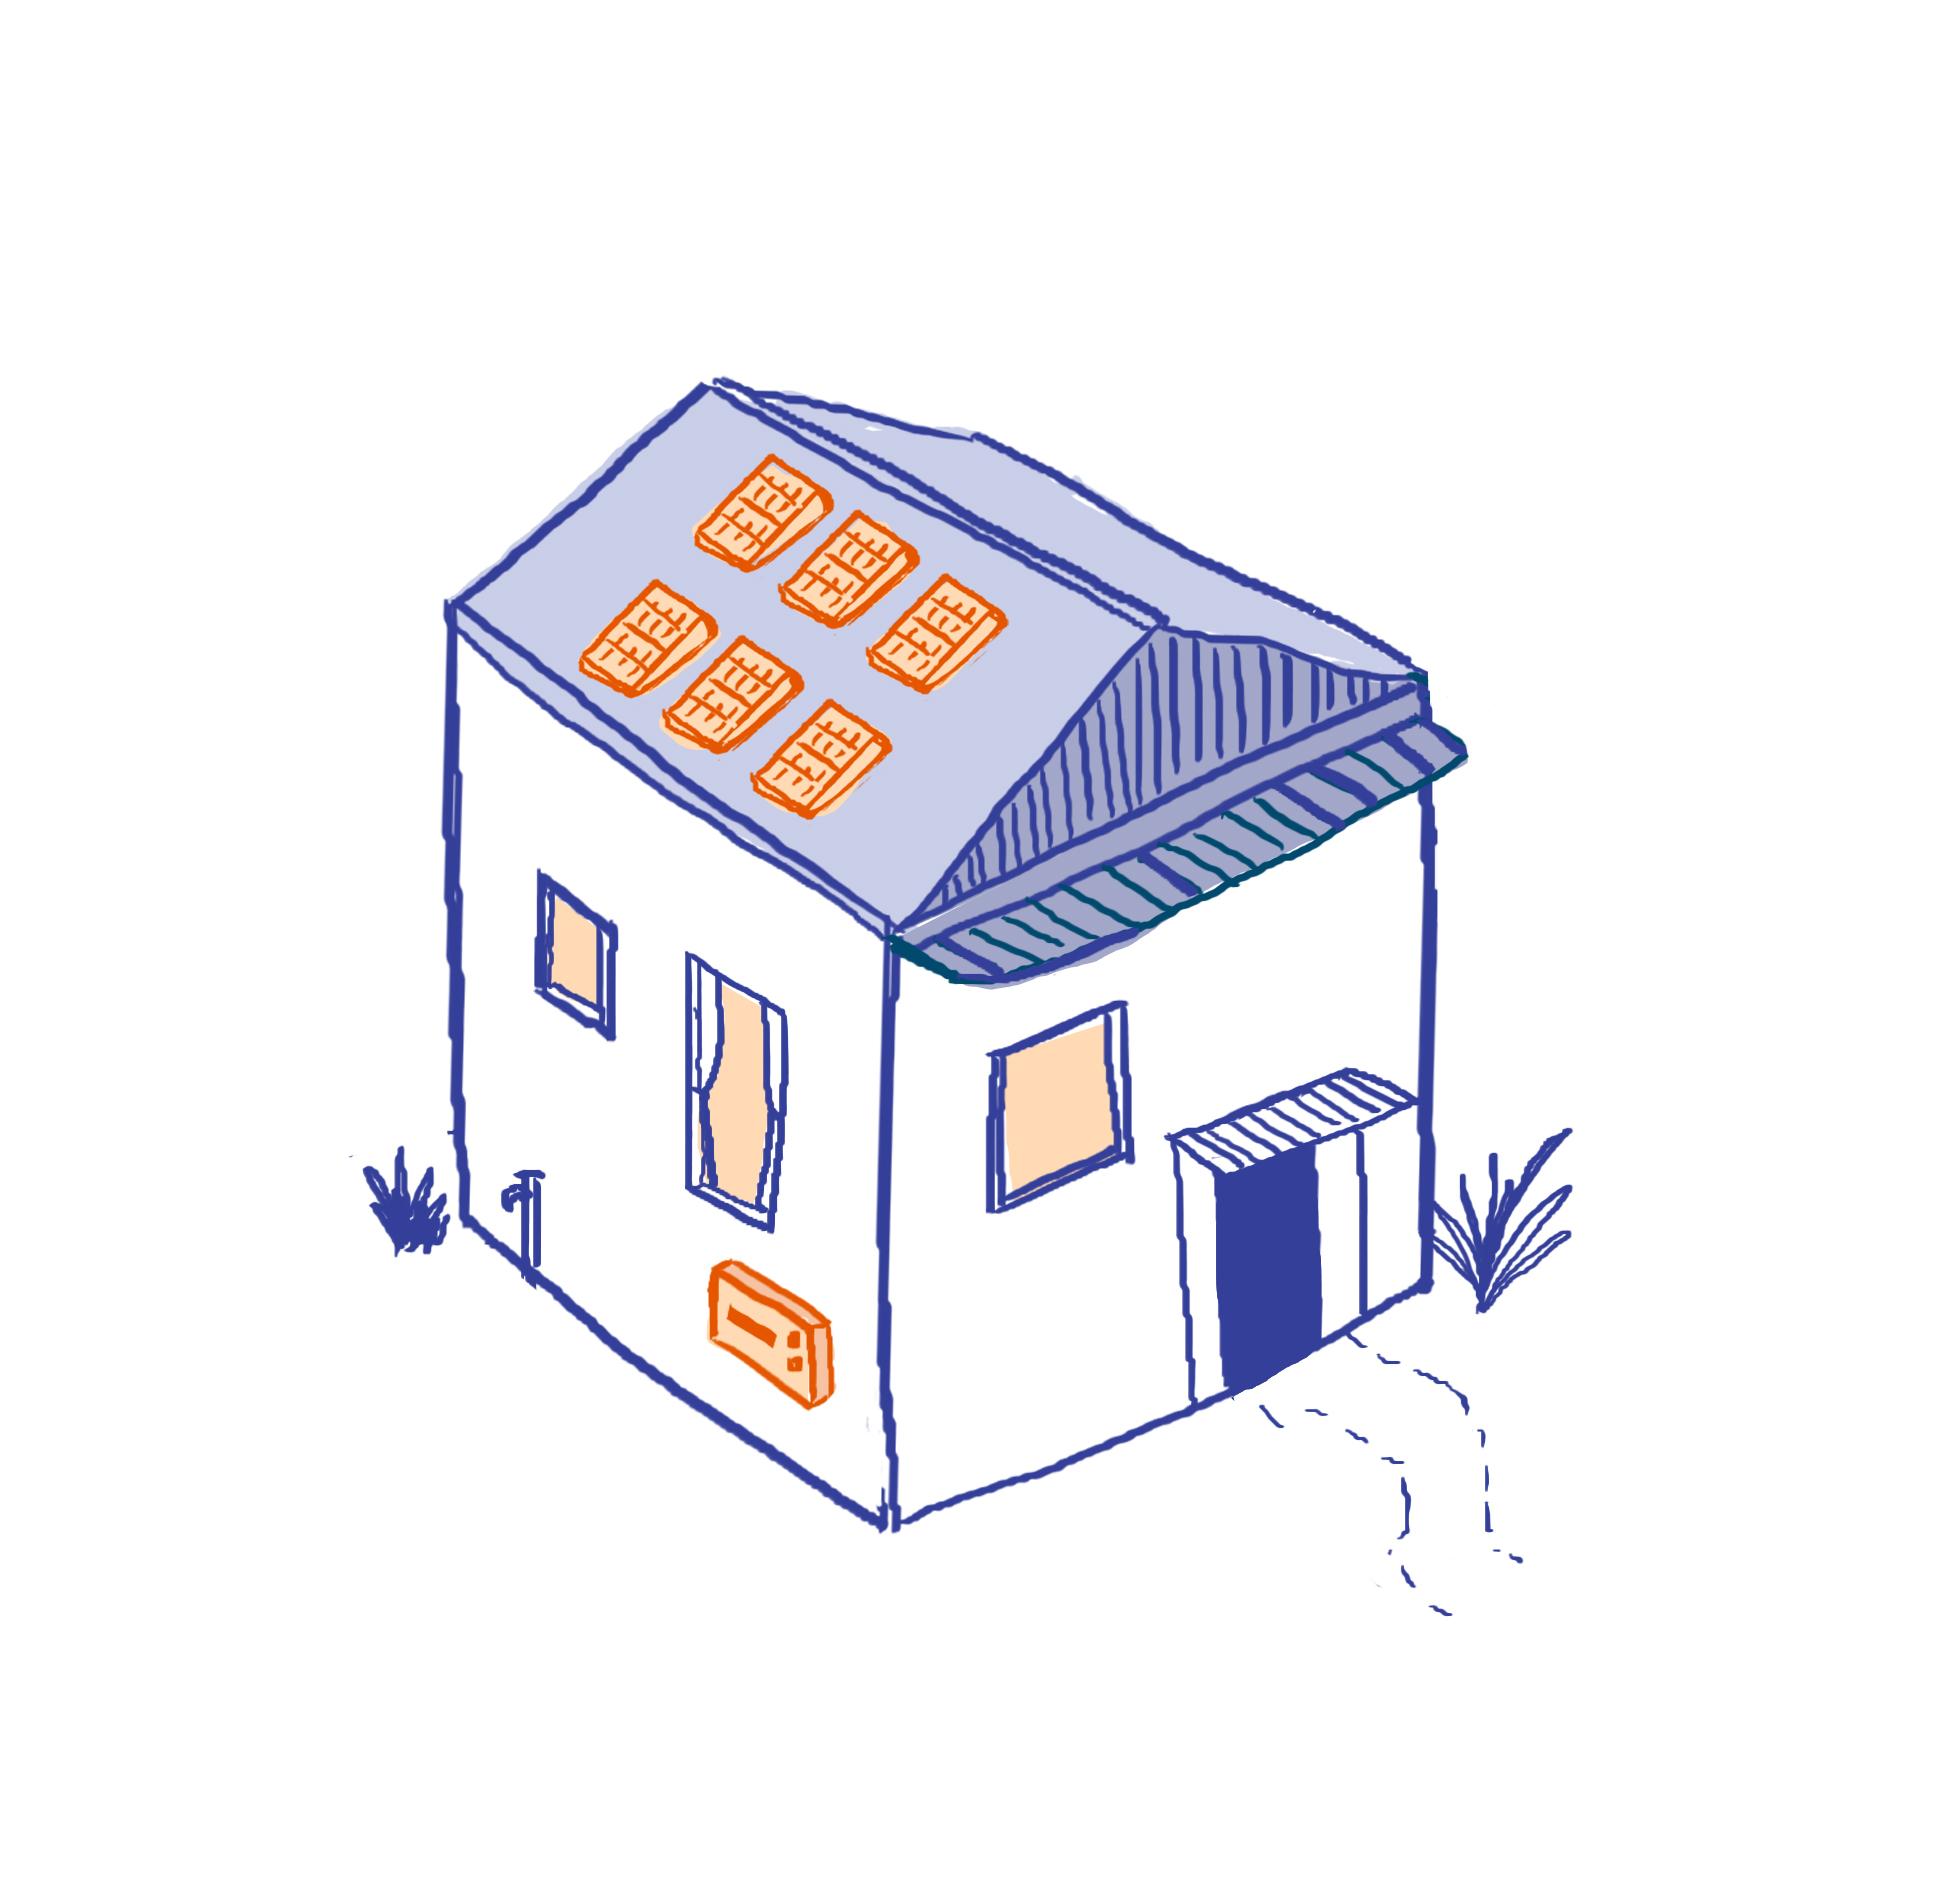 House_HighRes.jpg